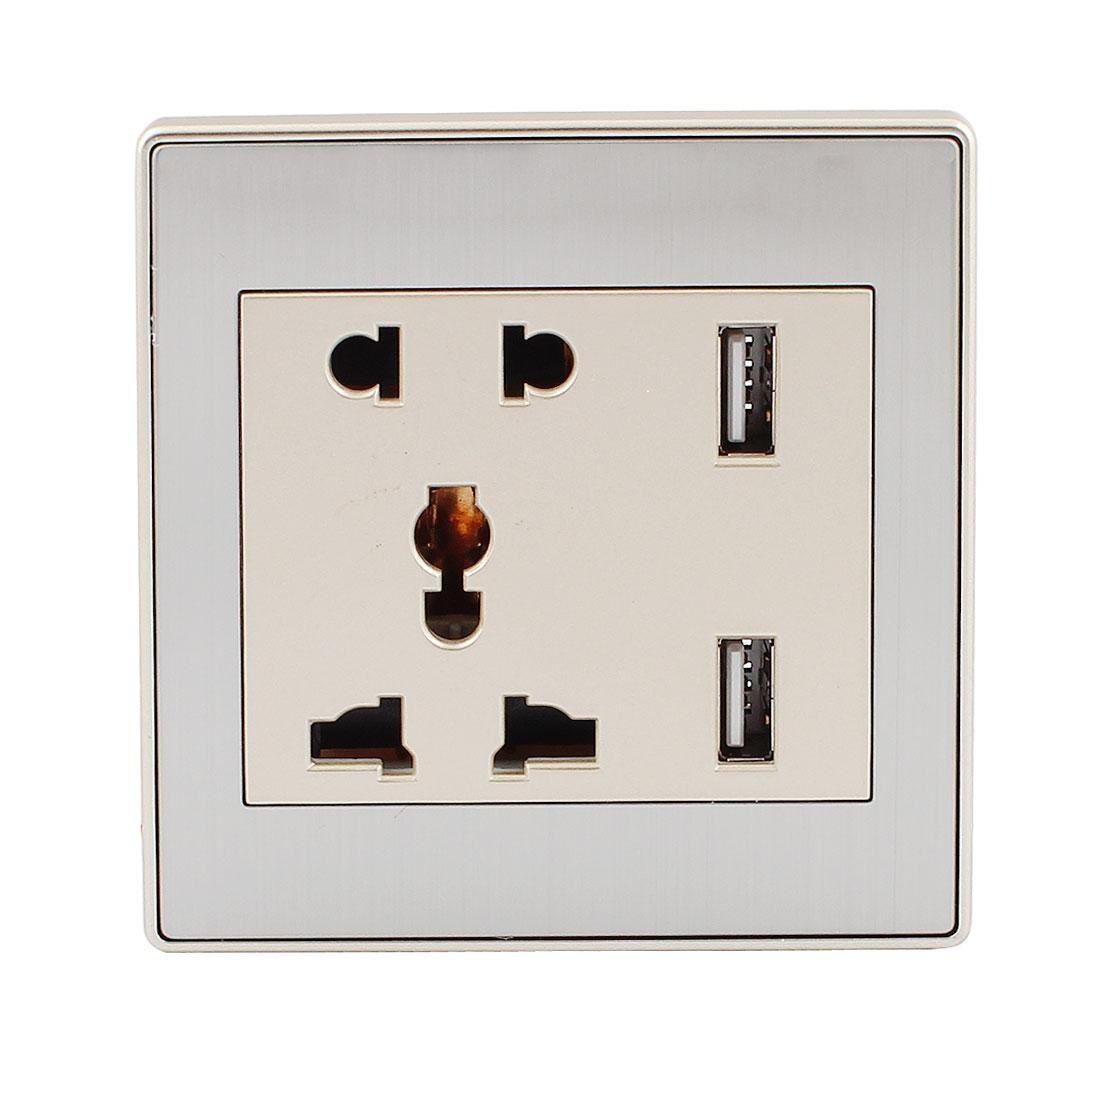 AC 110V-250V AU EU UK US Socket 2 USB Port Charger DC 5V 2100mA Mains Power Gold Tone